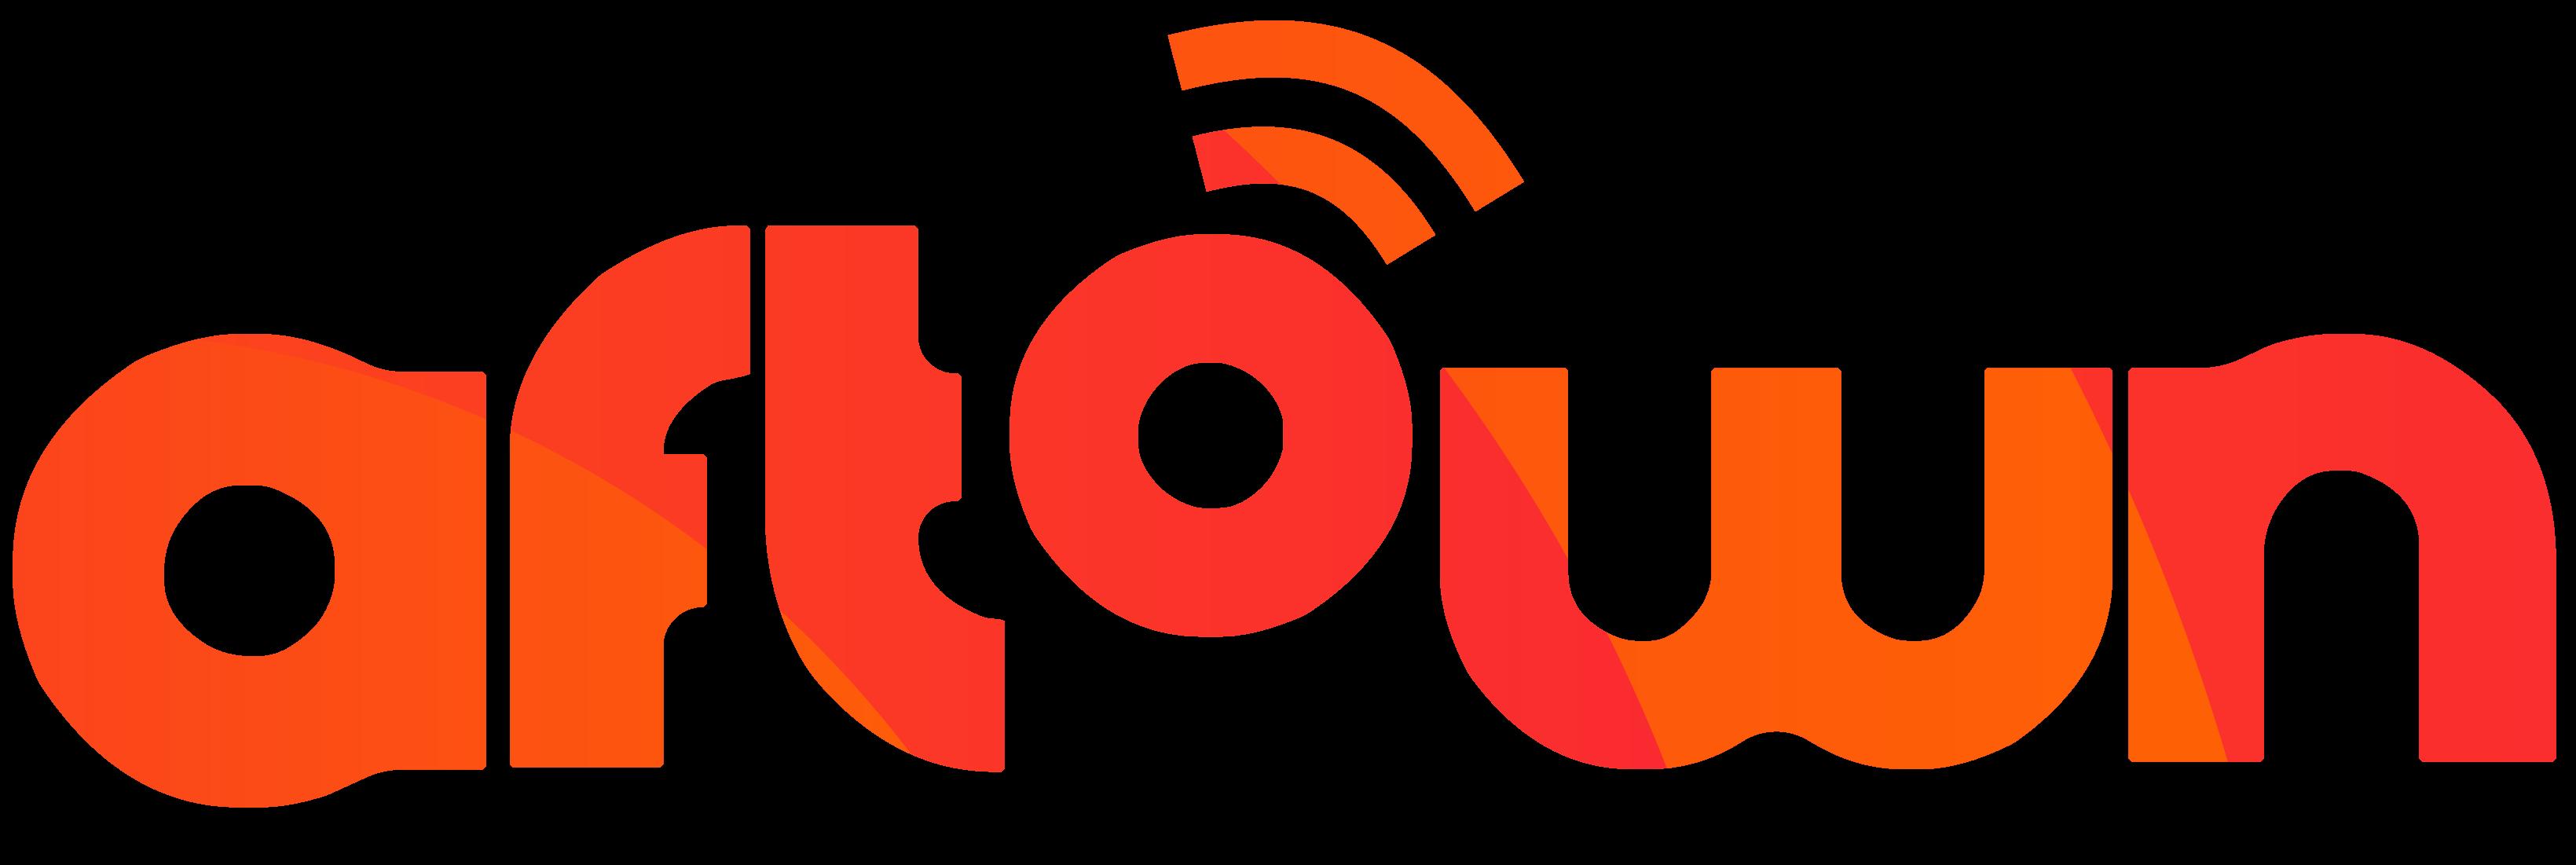 aftown radio